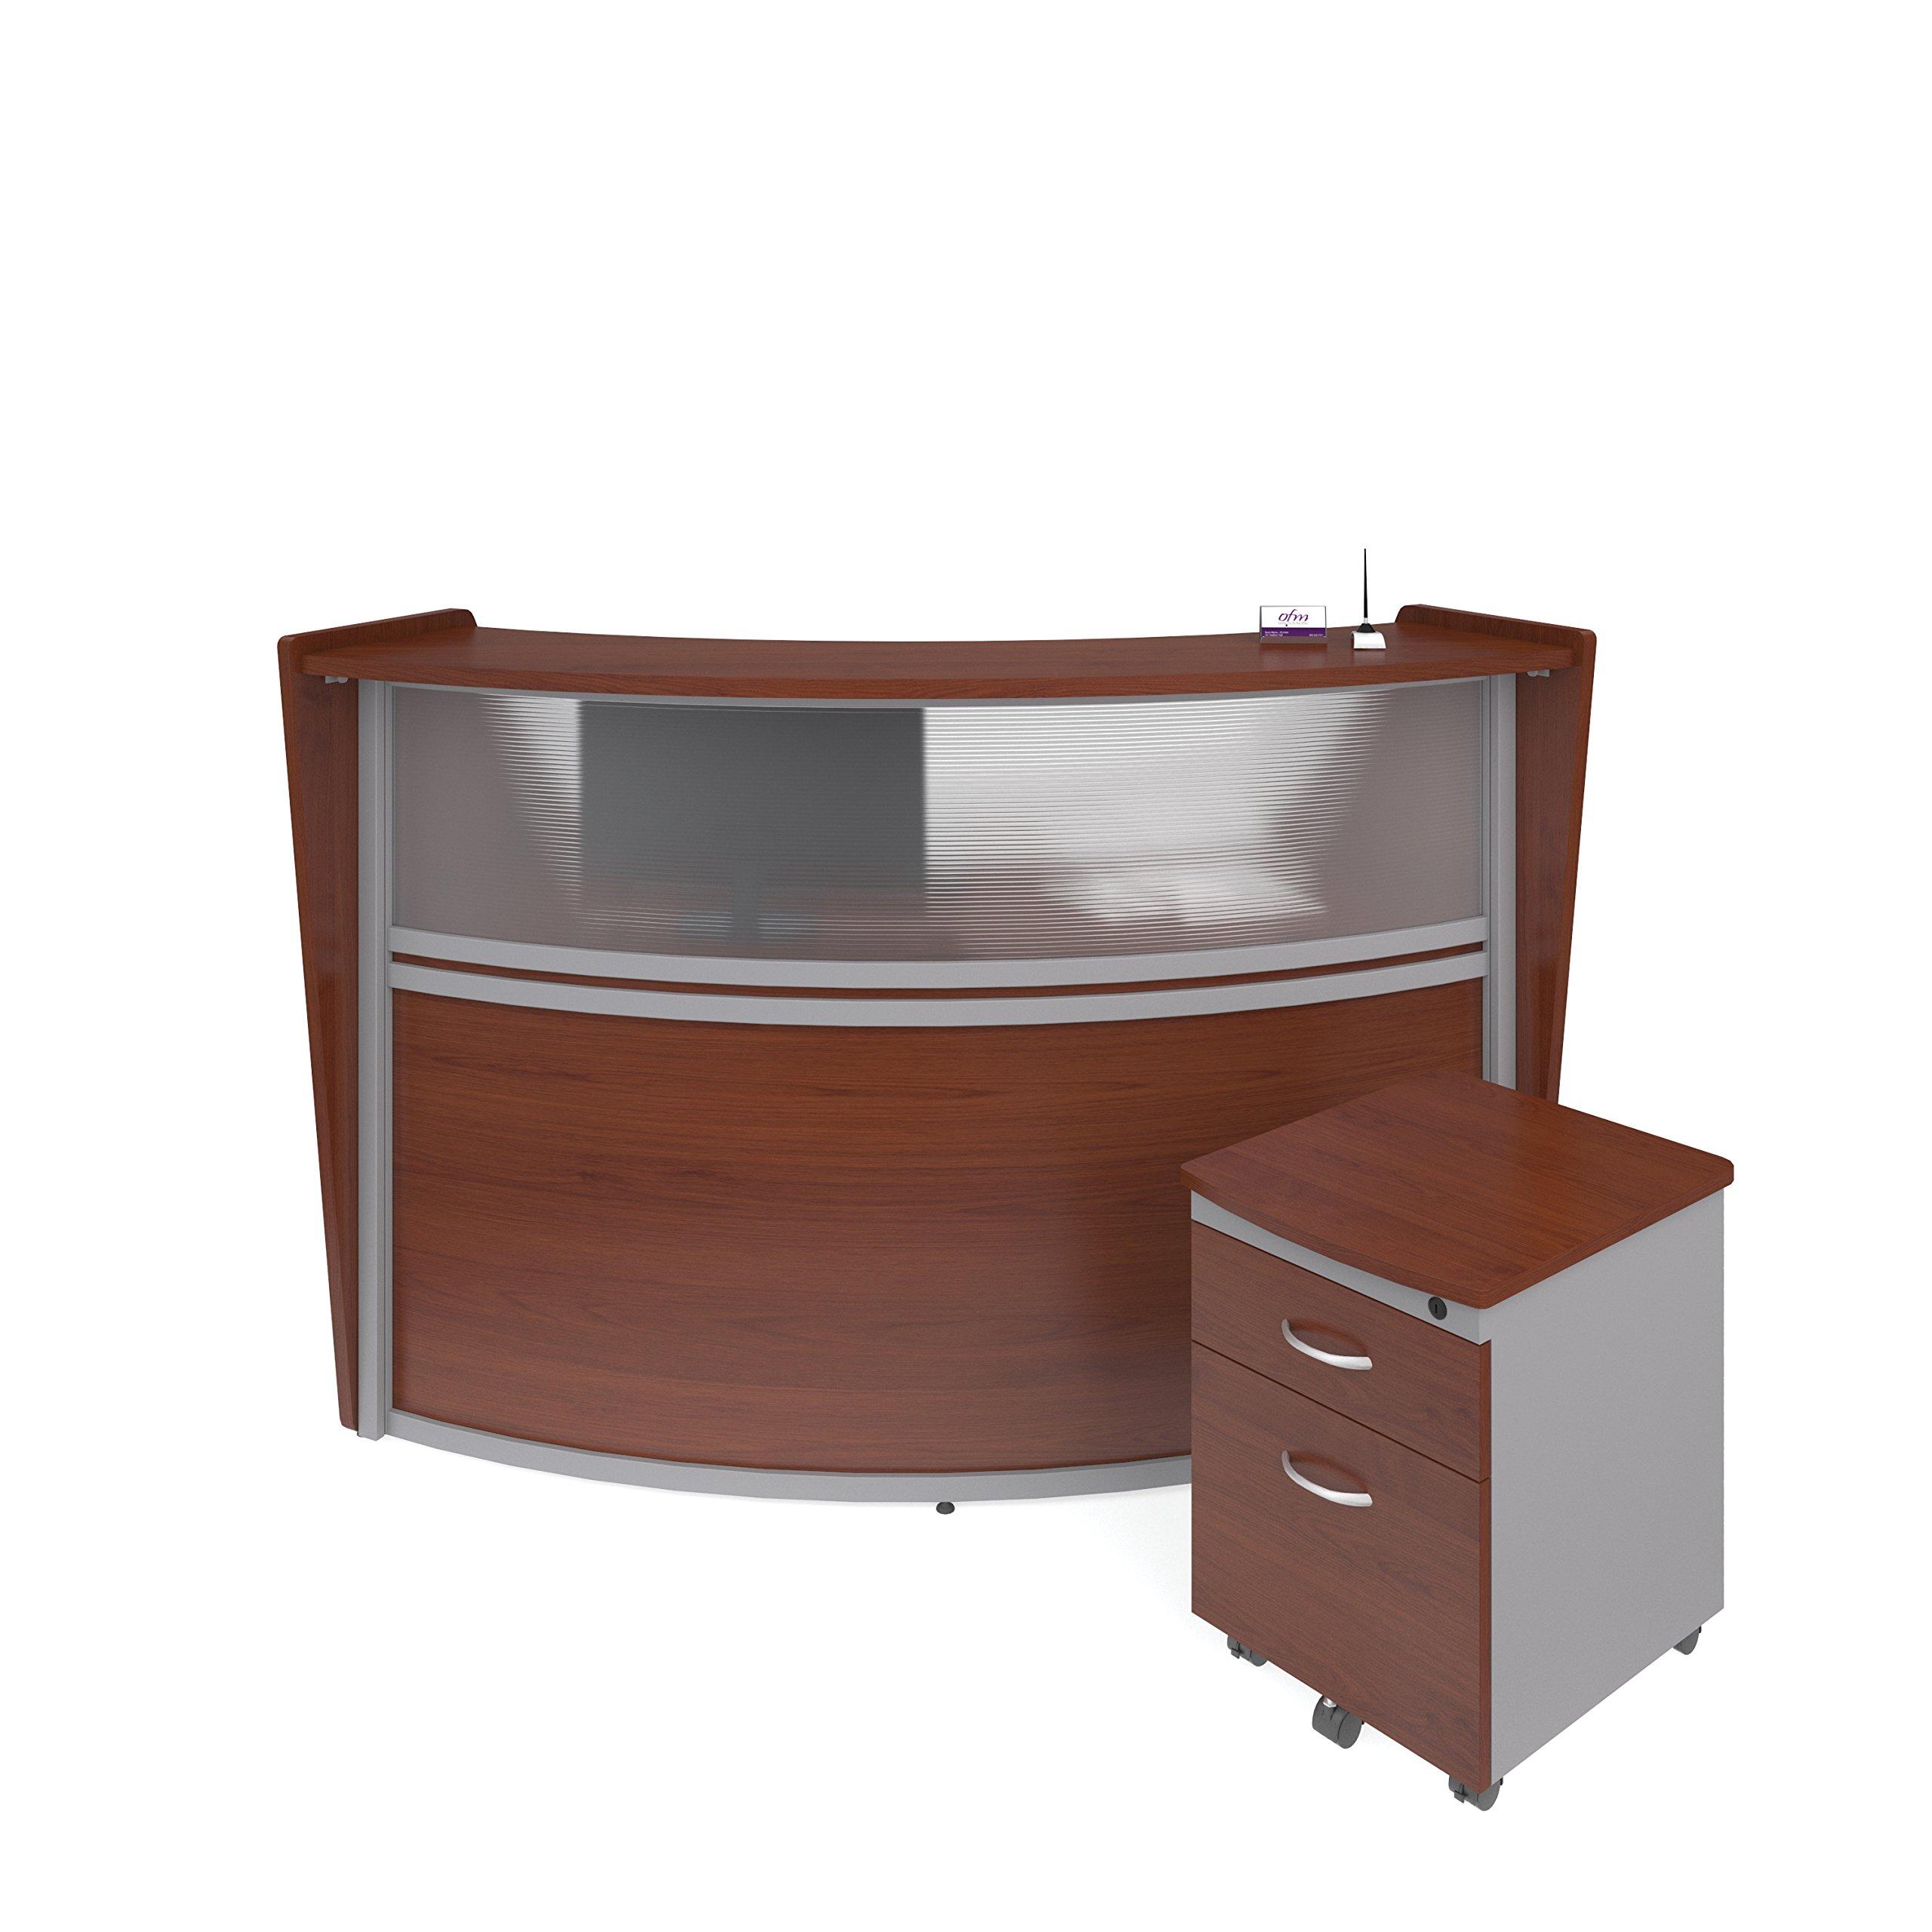 OFM Marque Series Plexi Single-Unit Curved Reception Station - Office Furniture Receptionist/Secretary Desk with Cherry Pedestal (PKG-55310-CHY)